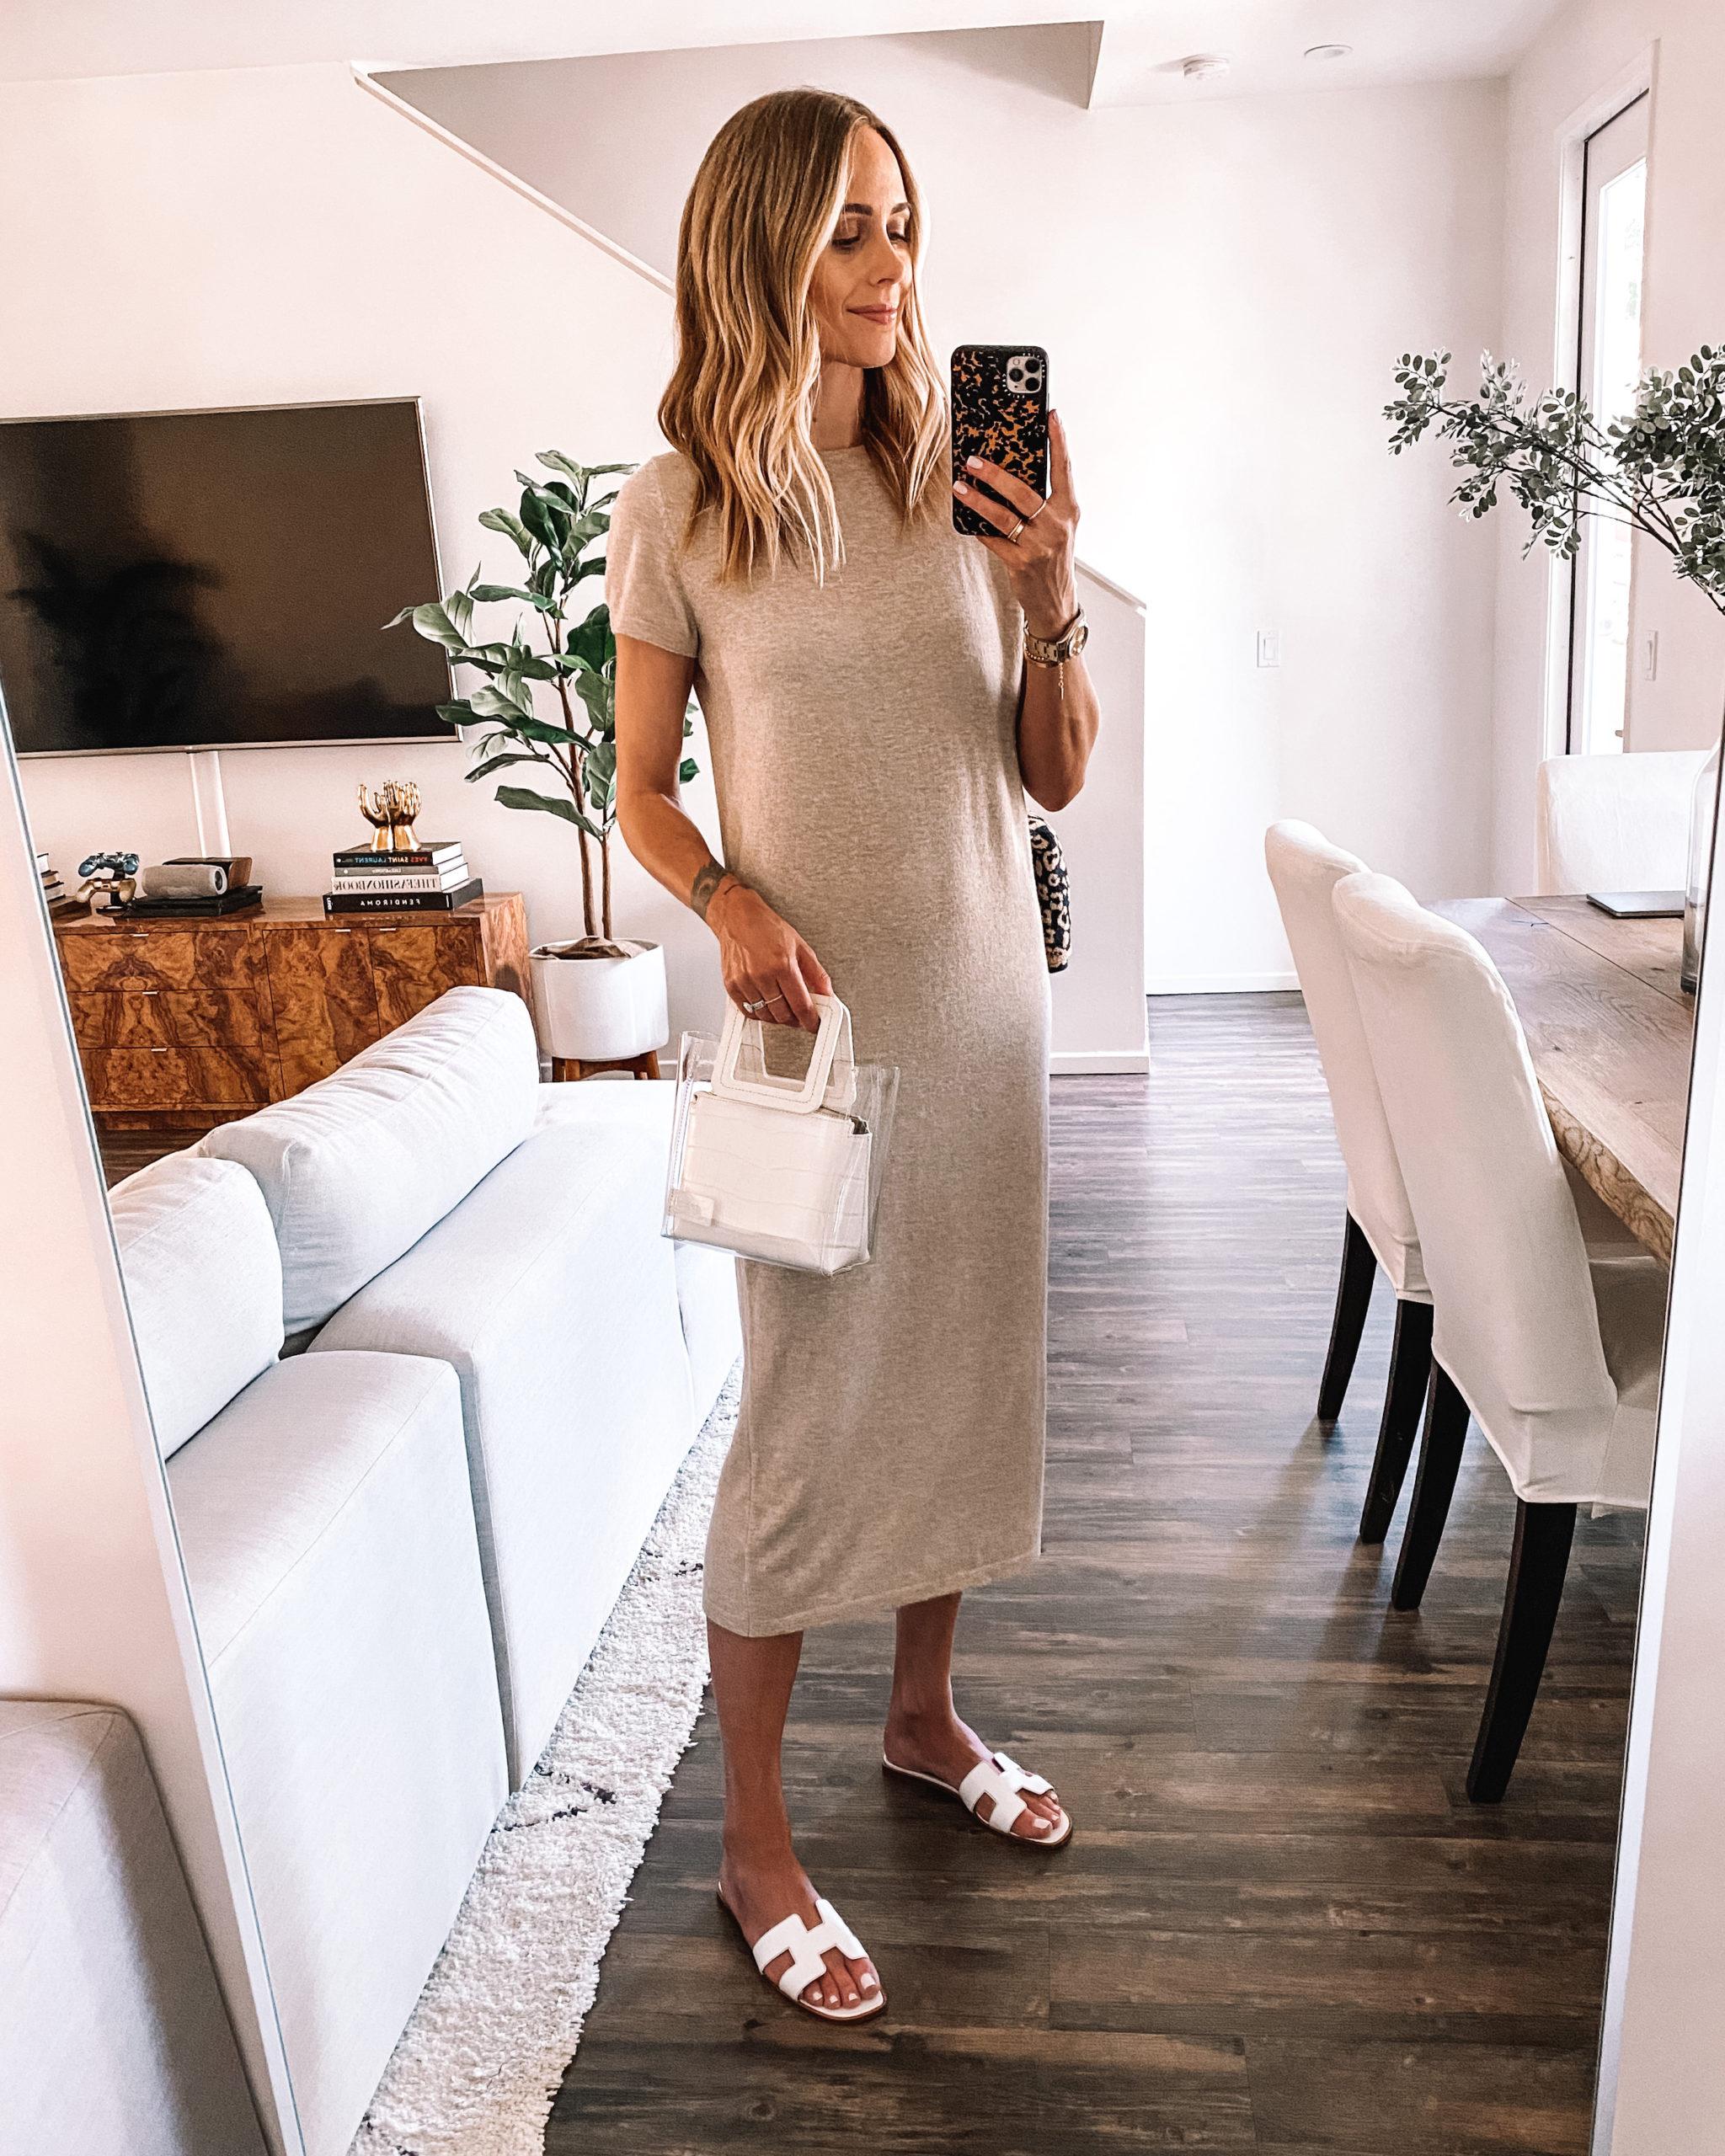 Fashion Jackson Wearing Jenni Kayne Tshirt Dress Sandals